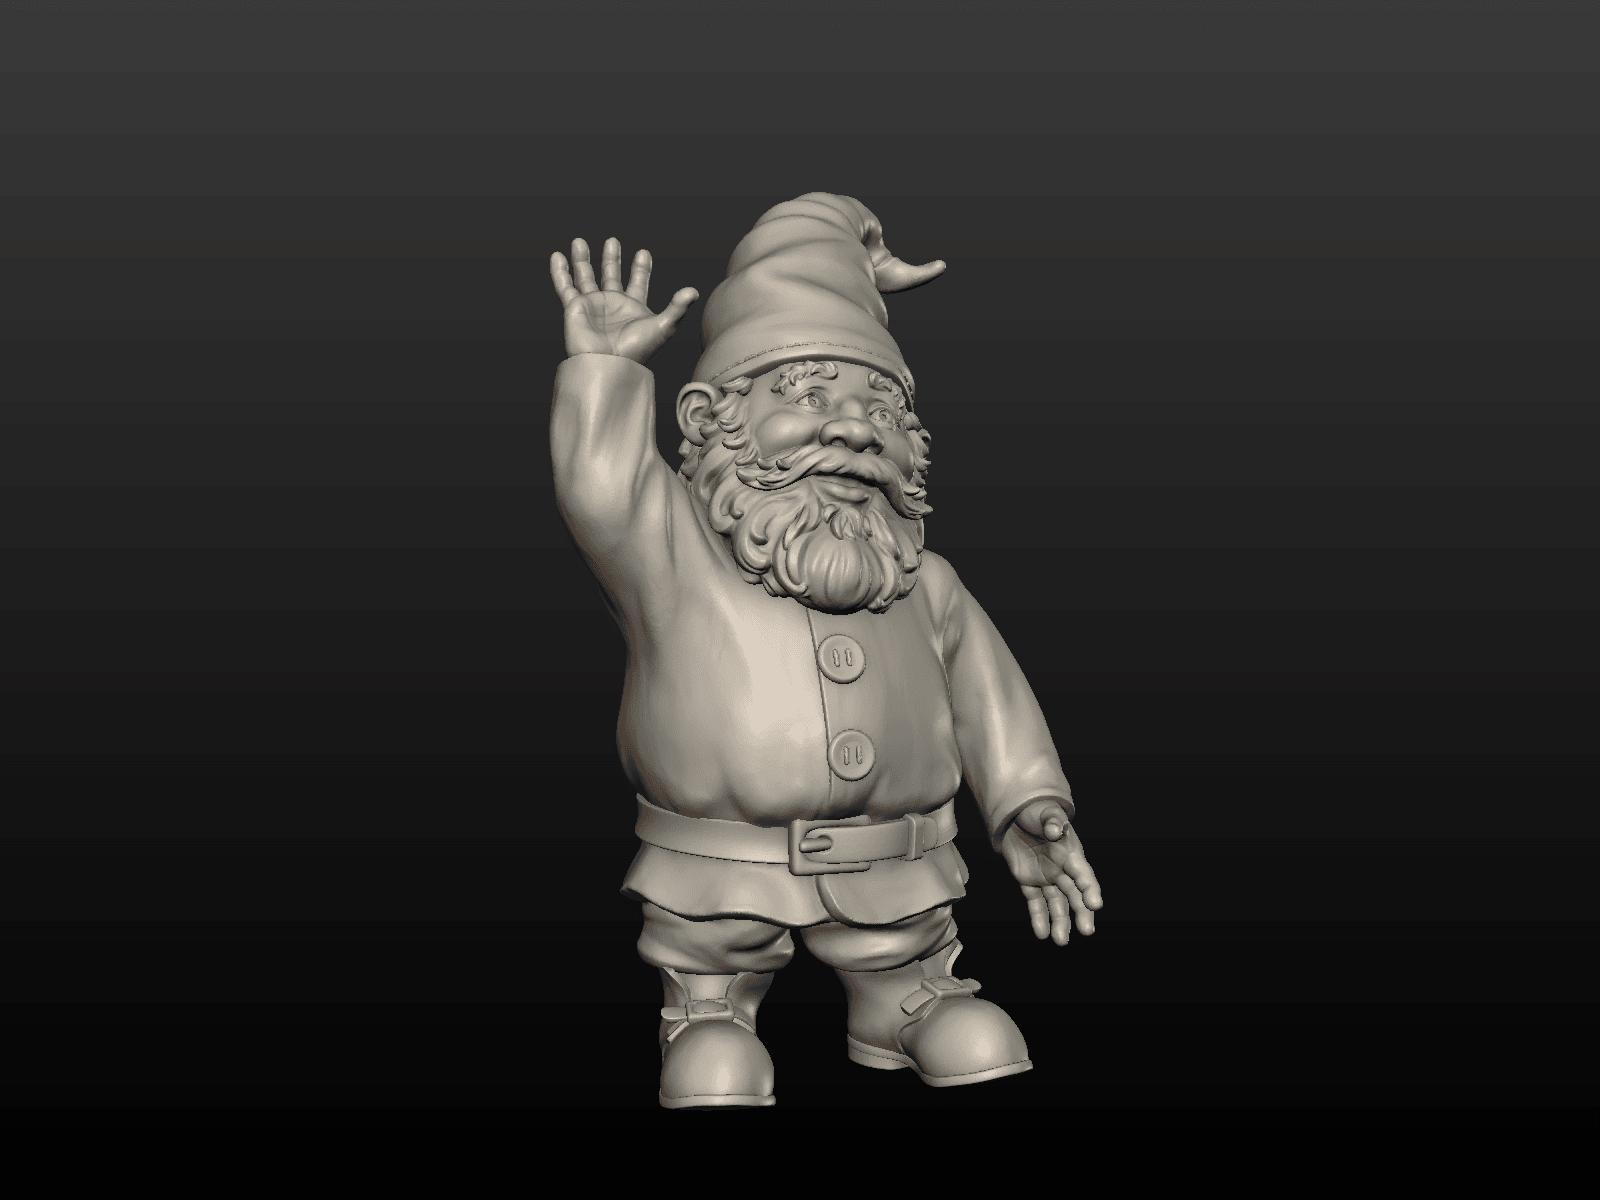 Garden_Gnome-02.png Download STL file Garden Gnome • 3D printing design, Skazok